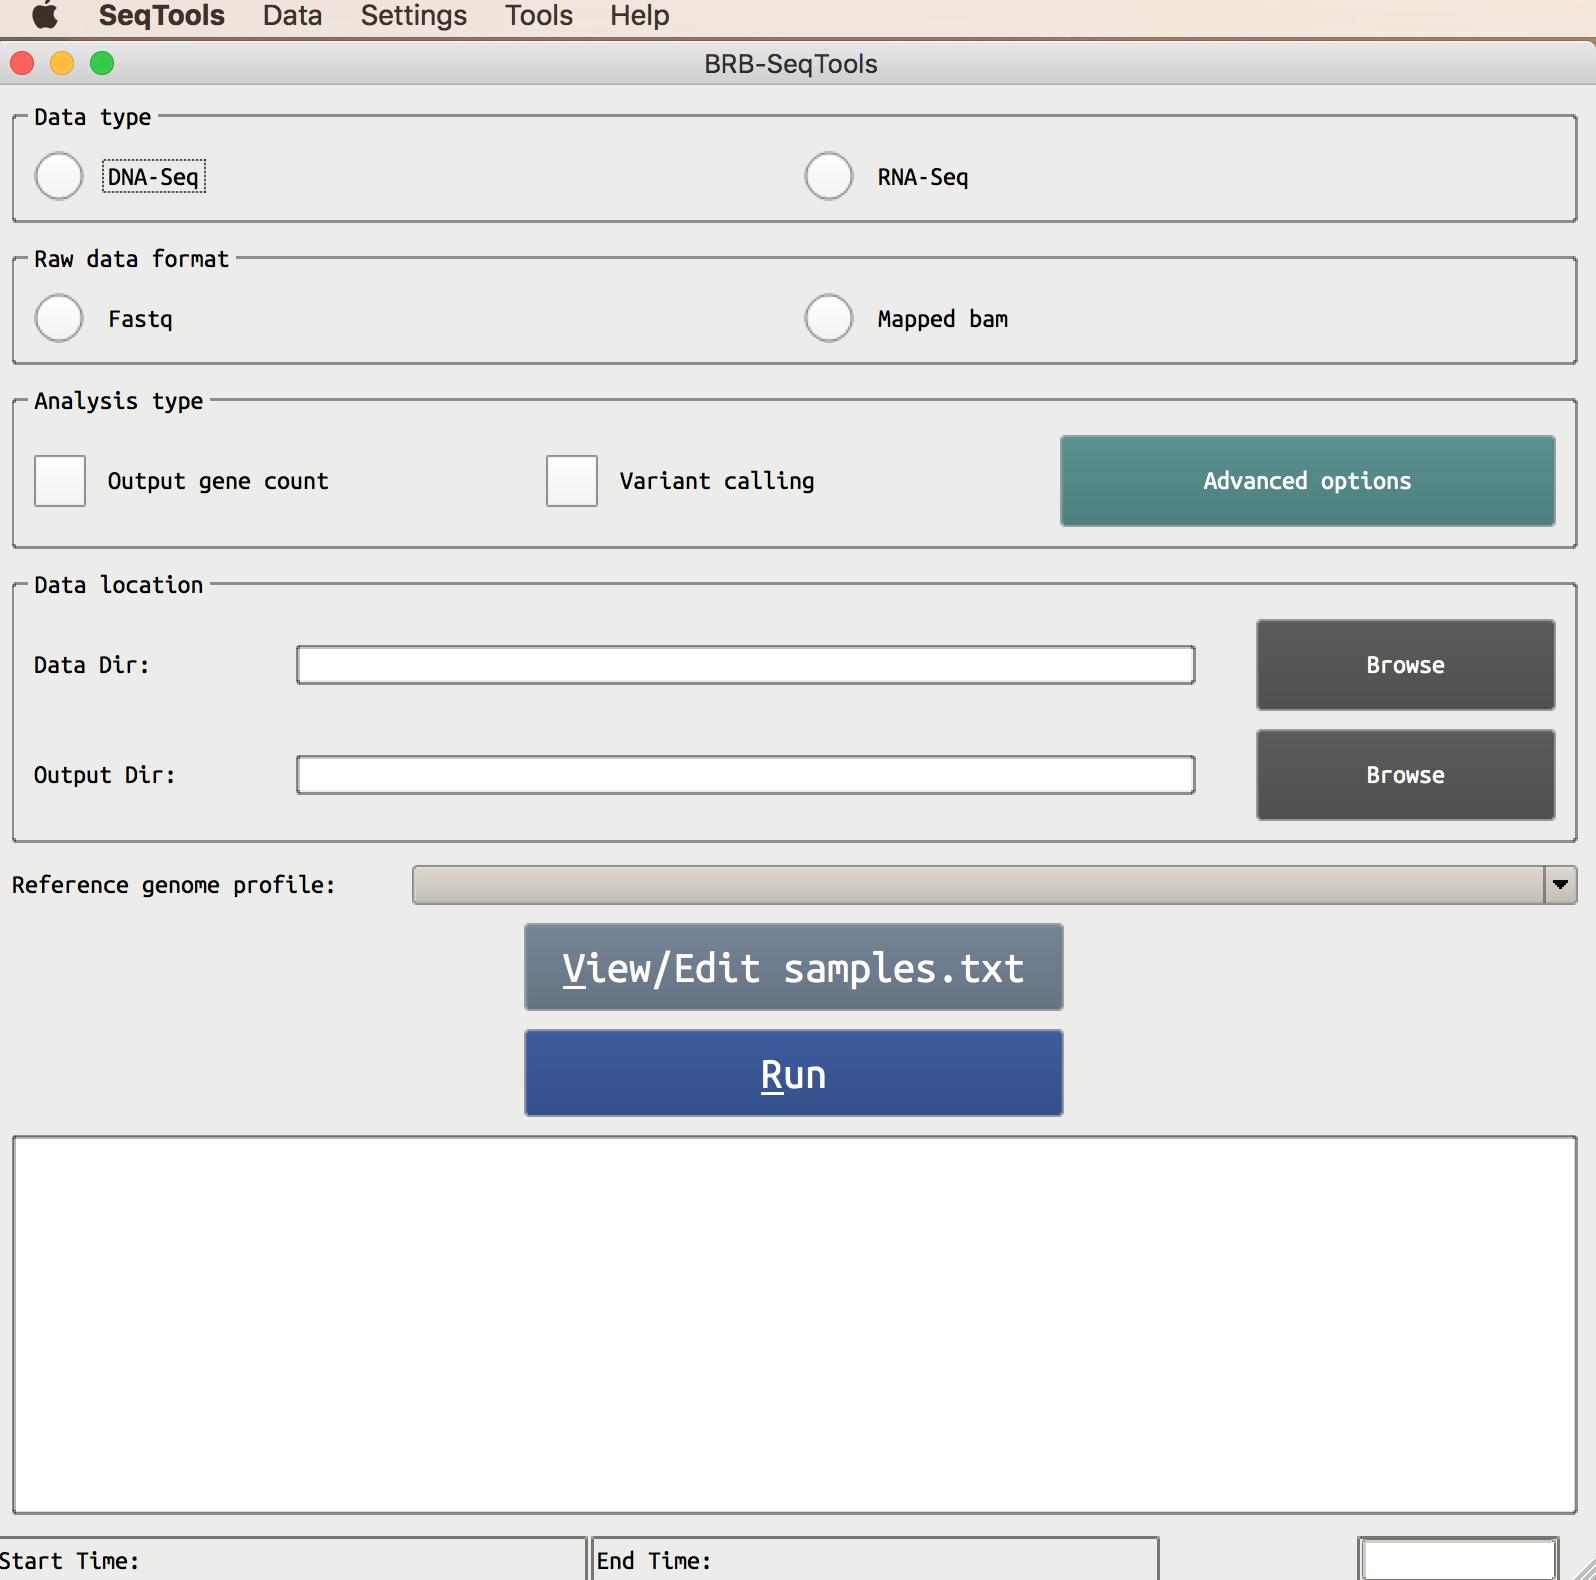 Running BRB-SeqTools on Mac OS